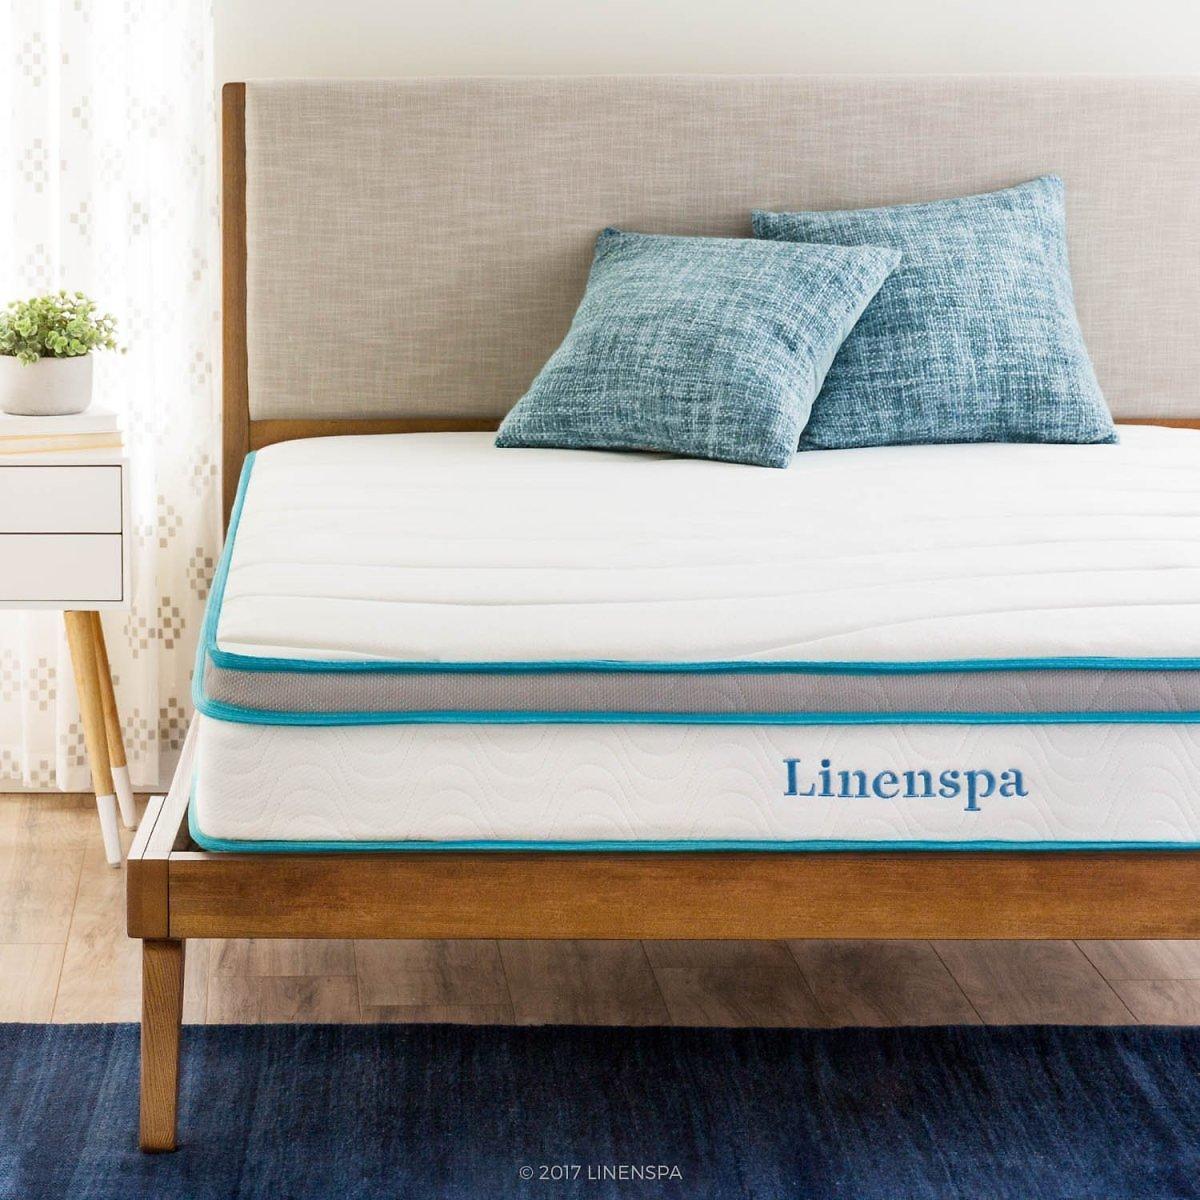 "Prime Day Deal - LinenSpa 8"" Memory Foam and Innerspring Hybrid Mattress, Twin $72.00 + fs"